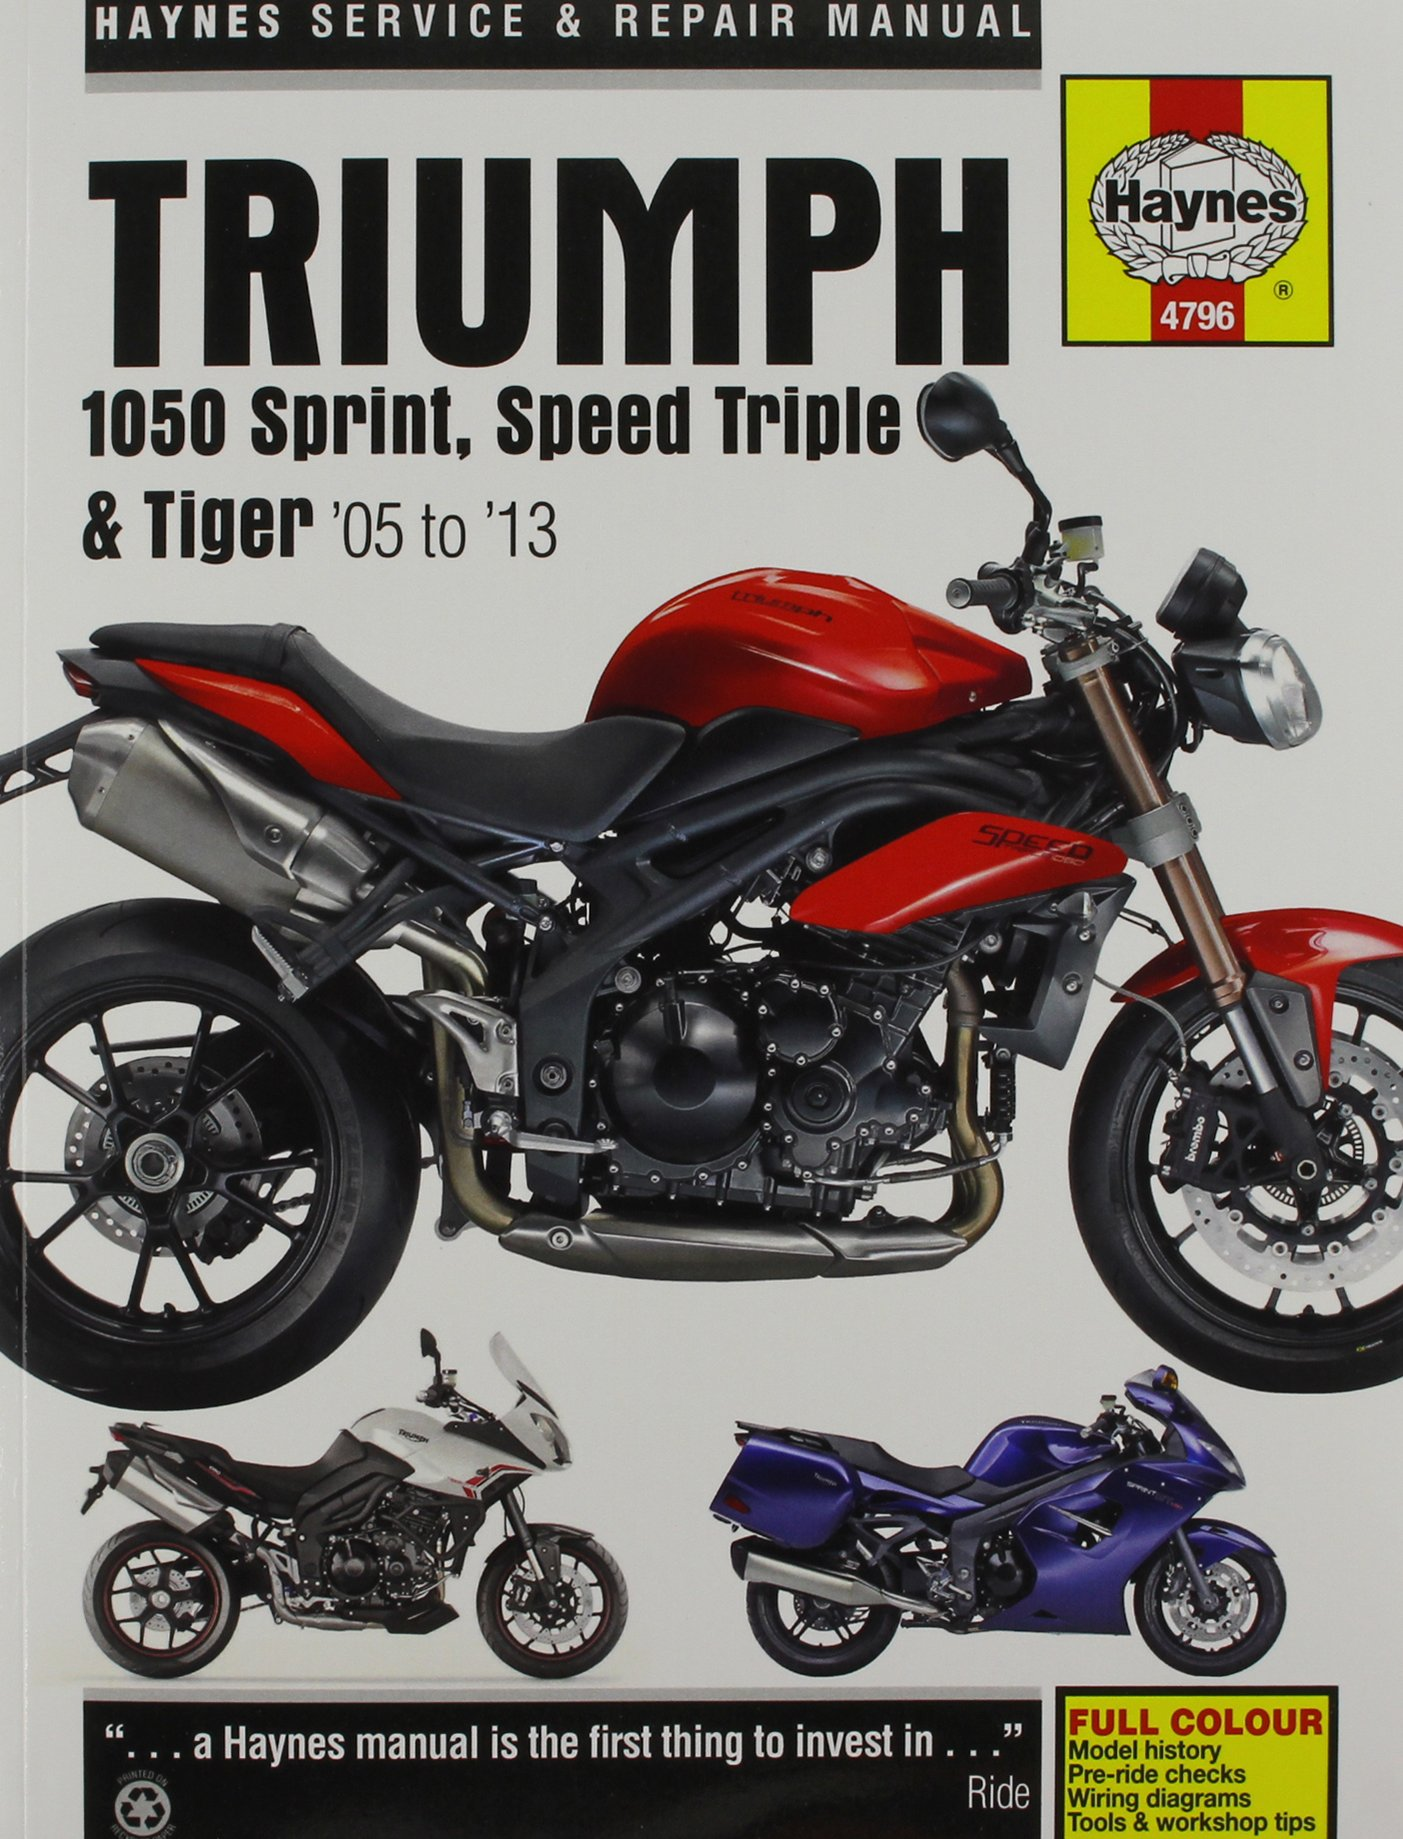 [CSDW_4250]   139BFF Triumph Speed Triple 1050 Workshop Repair Manuals Download | Wiring  Library | Triumph Sprint St Wiring Diagram |  | Wiring Library